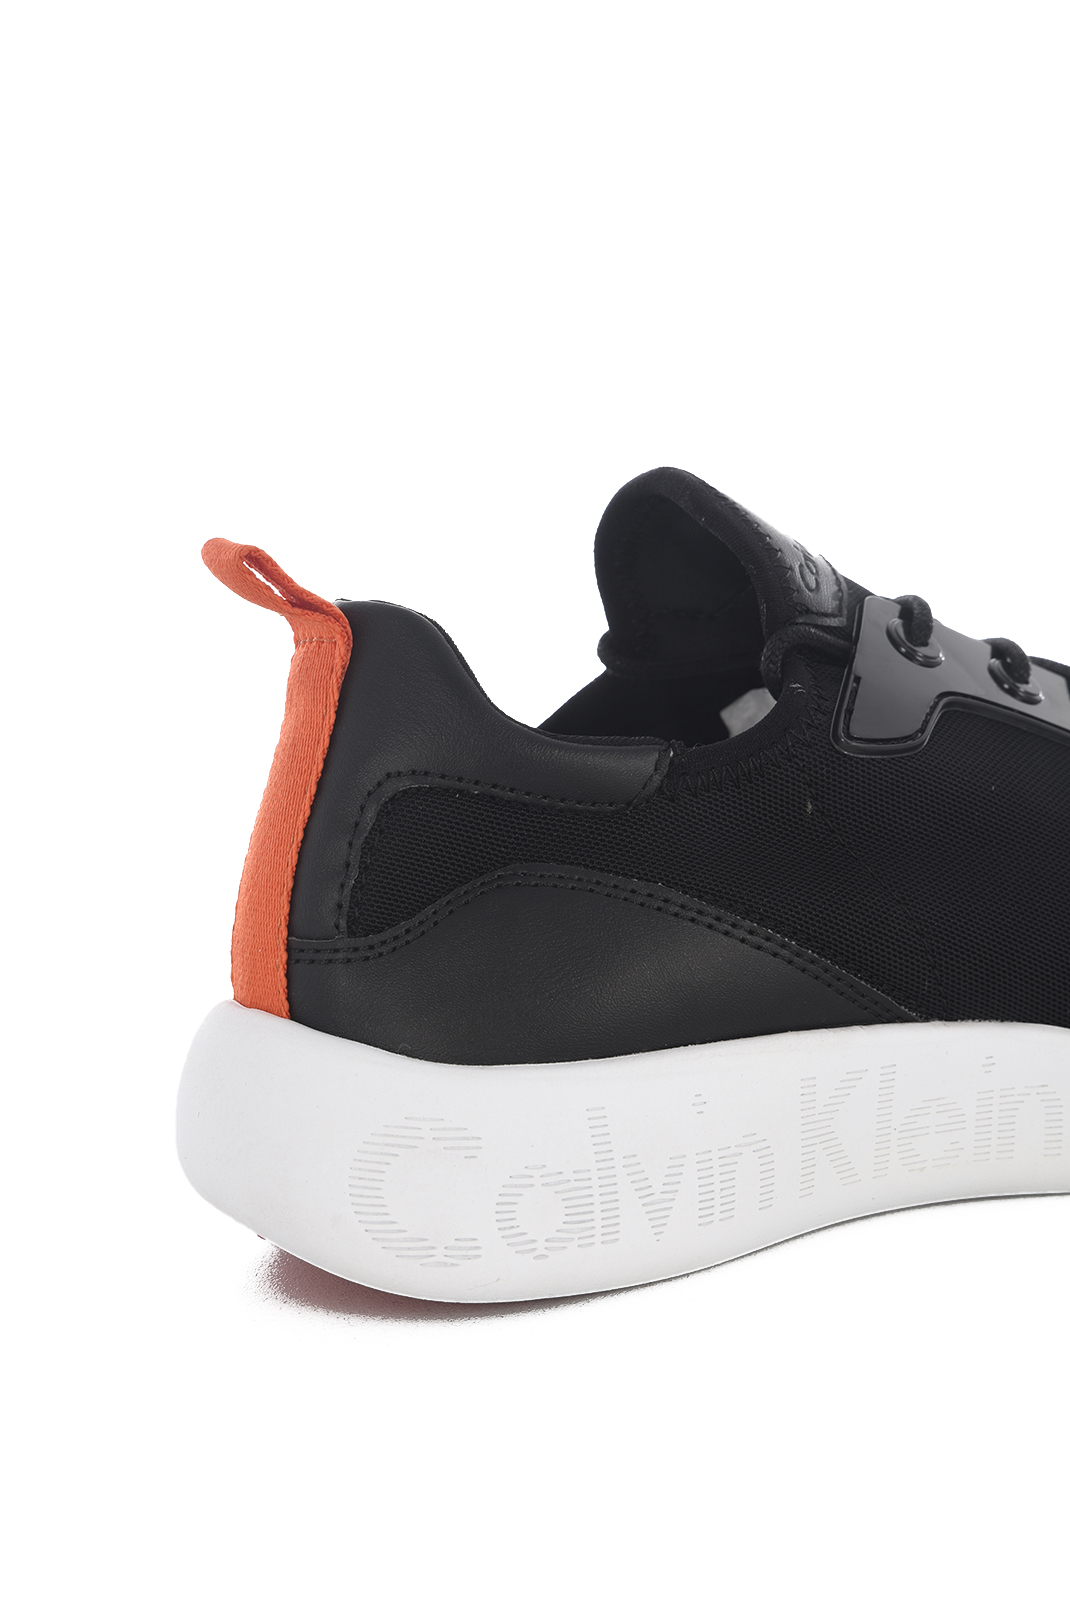 Baskets / Sport  Calvin klein MEL NOIR